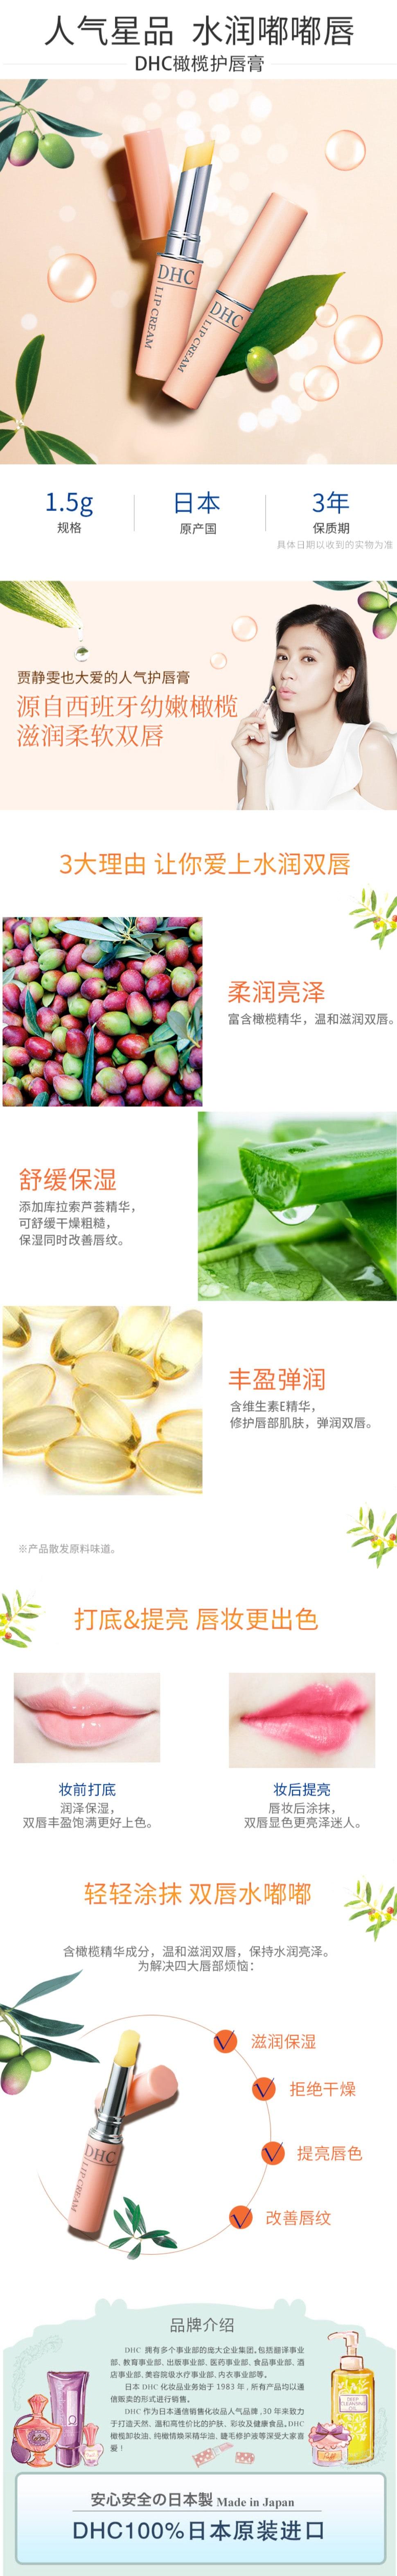 DHC Lip Cream - Introduction